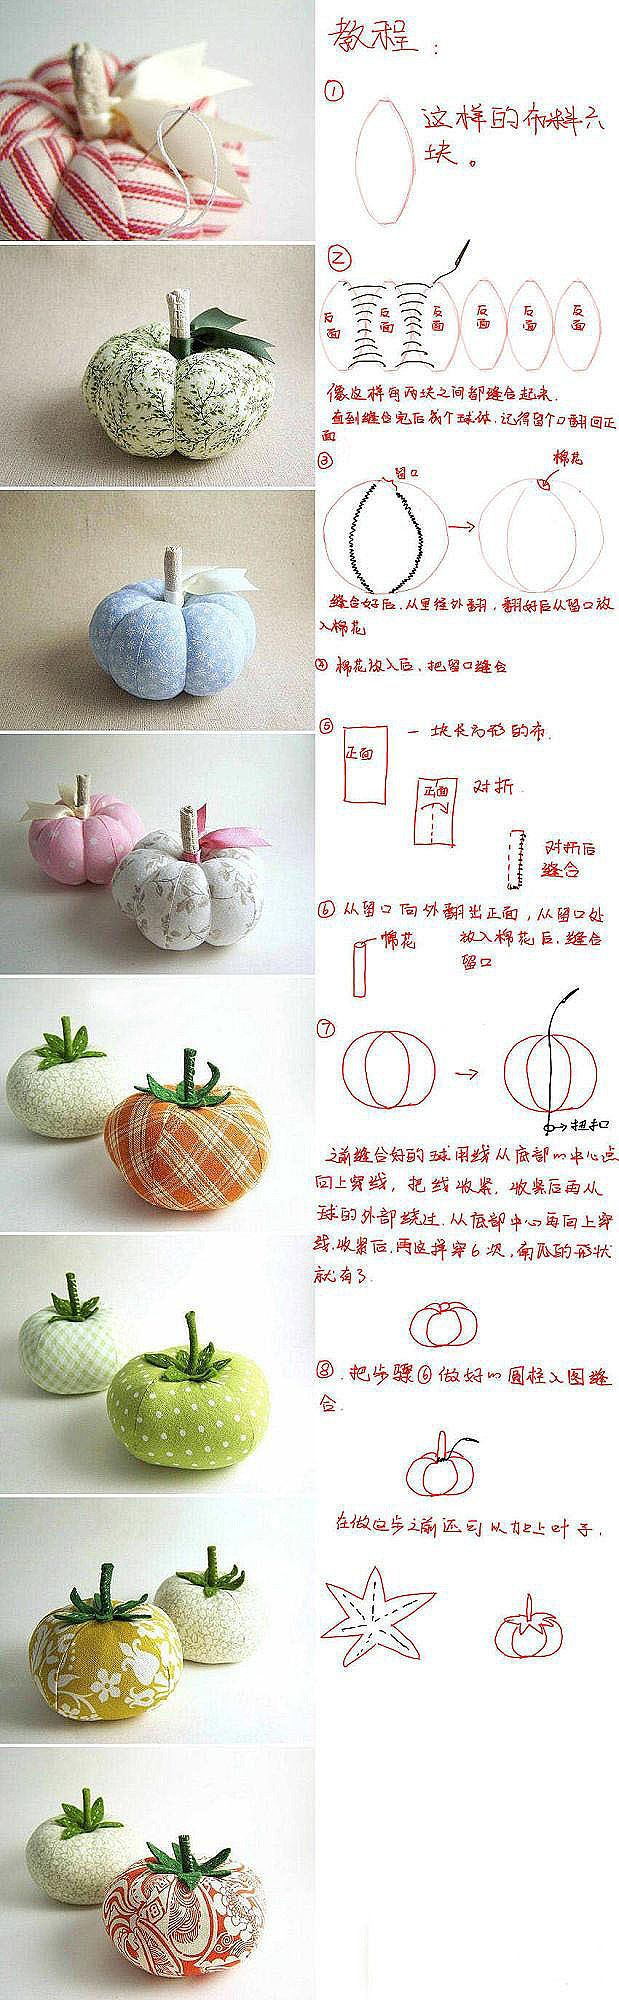 Fruits de tissu.